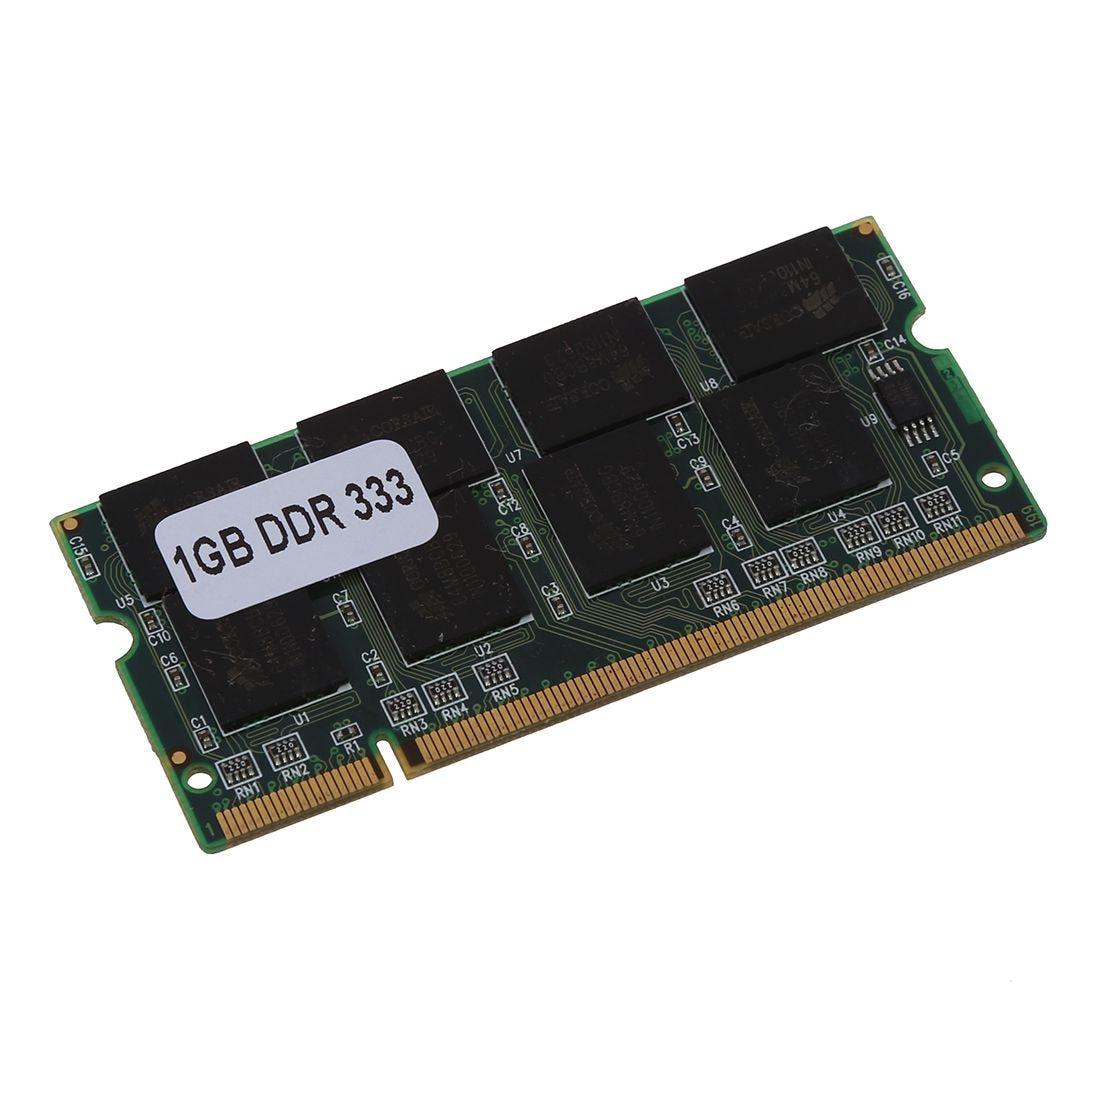 DDR1 1GB RAM PC2700 200Pin Sodimm Laptop Memory DDR 1GB,  333MHZ  NON-ECC PC DIMM